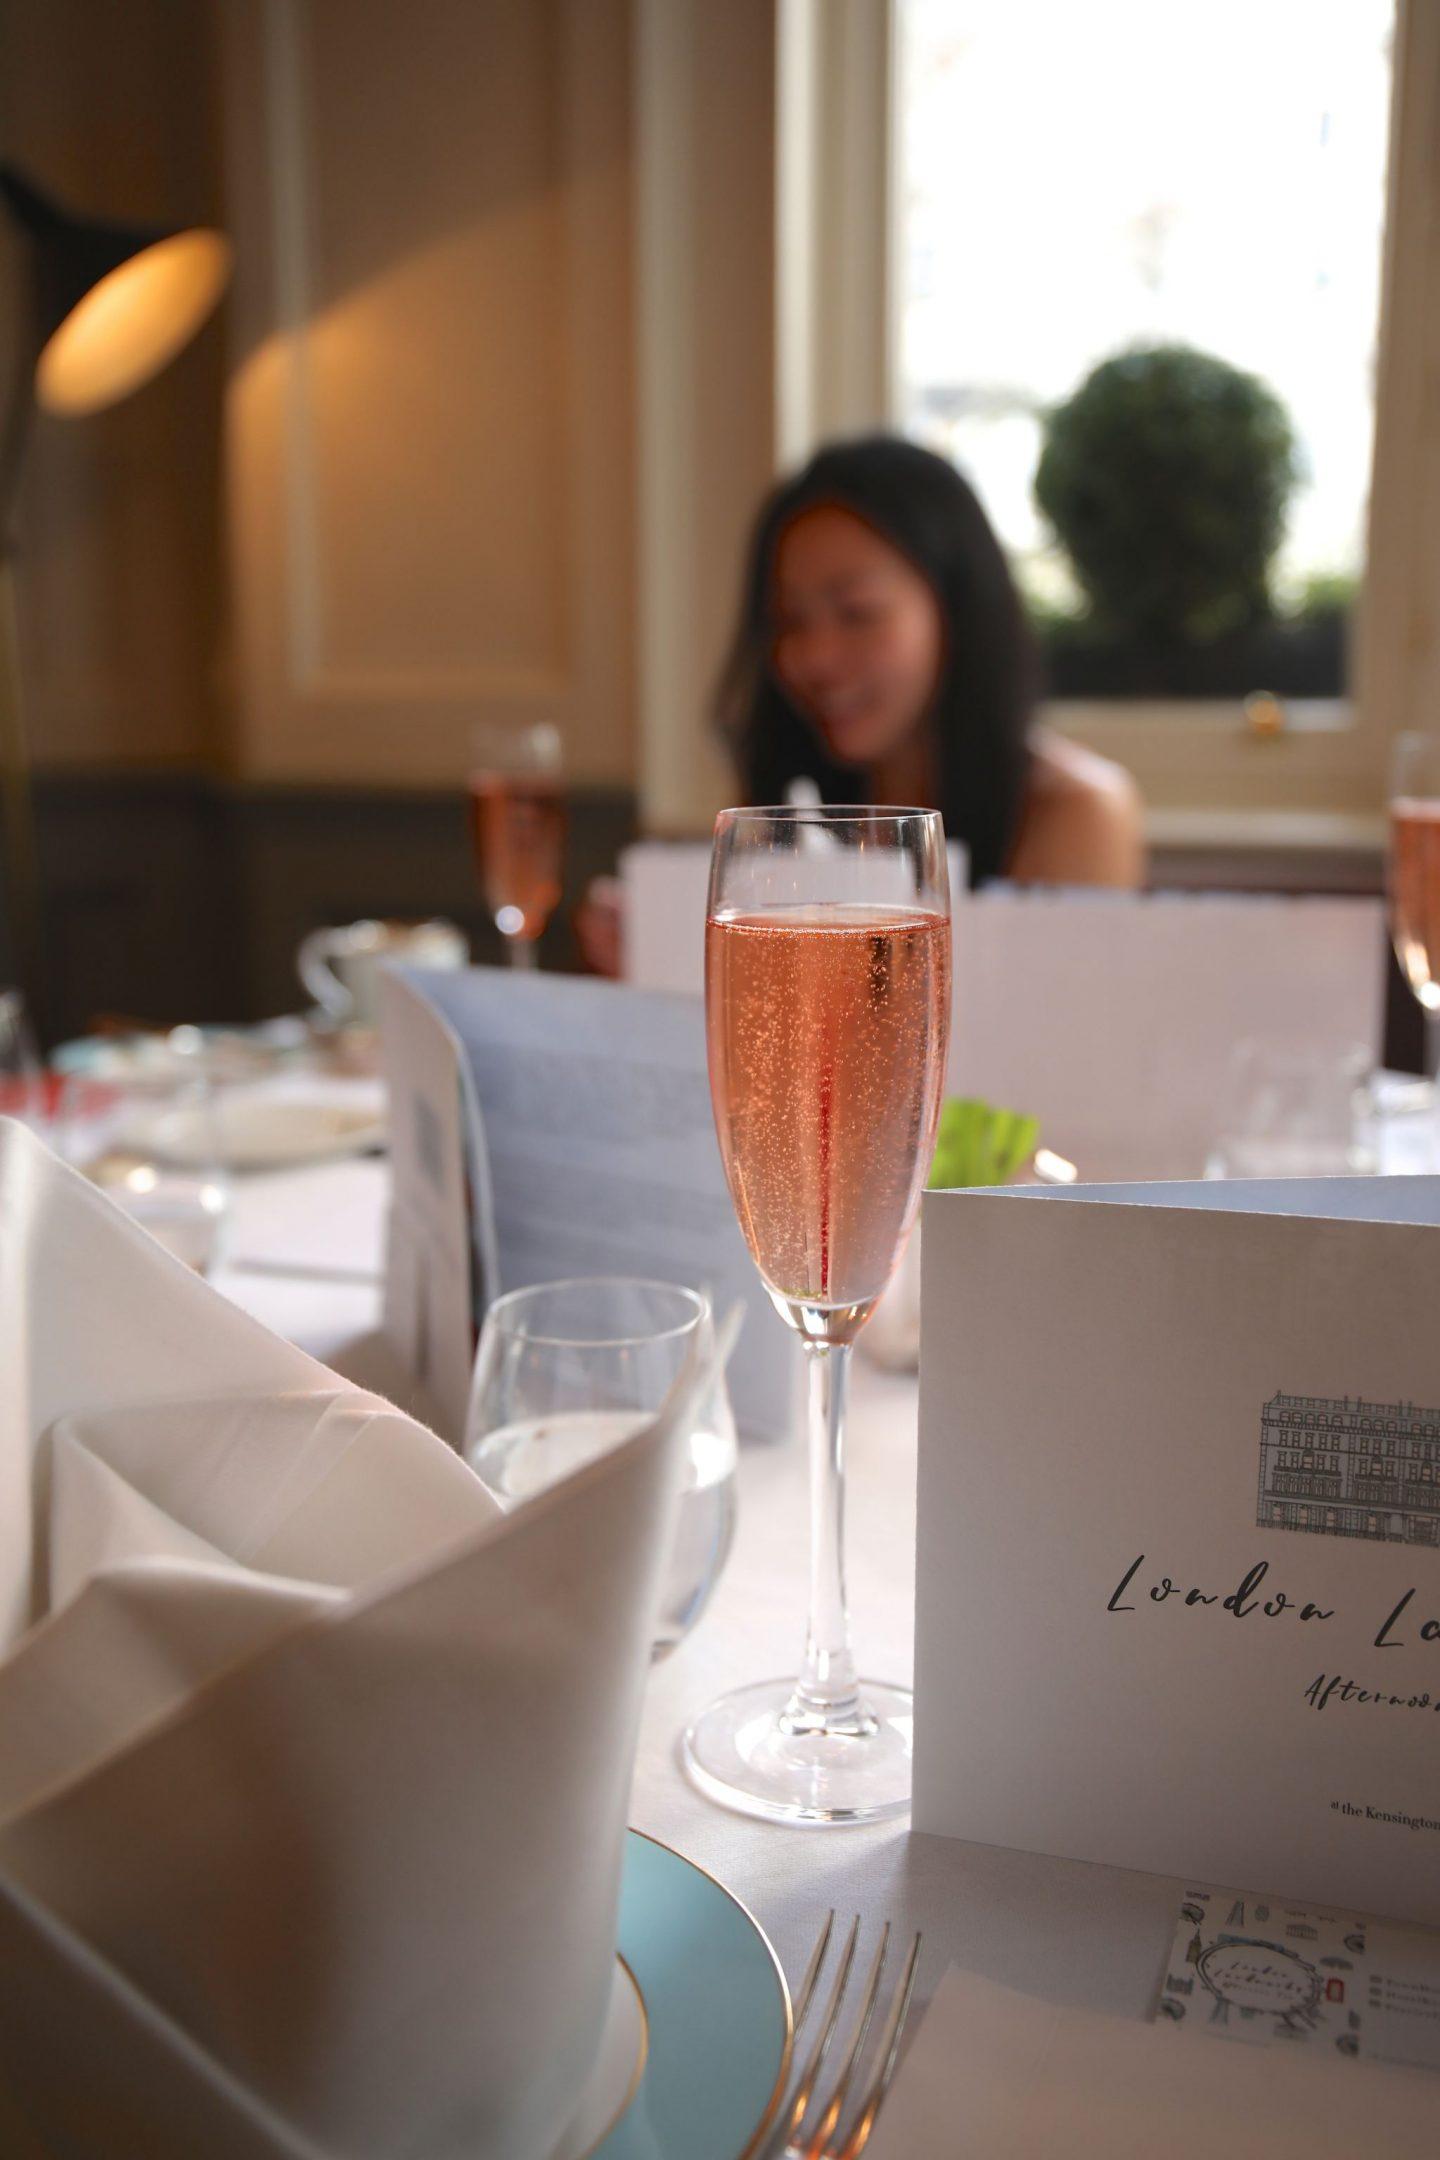 London Landmarks Afternoon Tea at The Townhouse Kensington Hotel, Katie KALANCHOE, Katie Heath